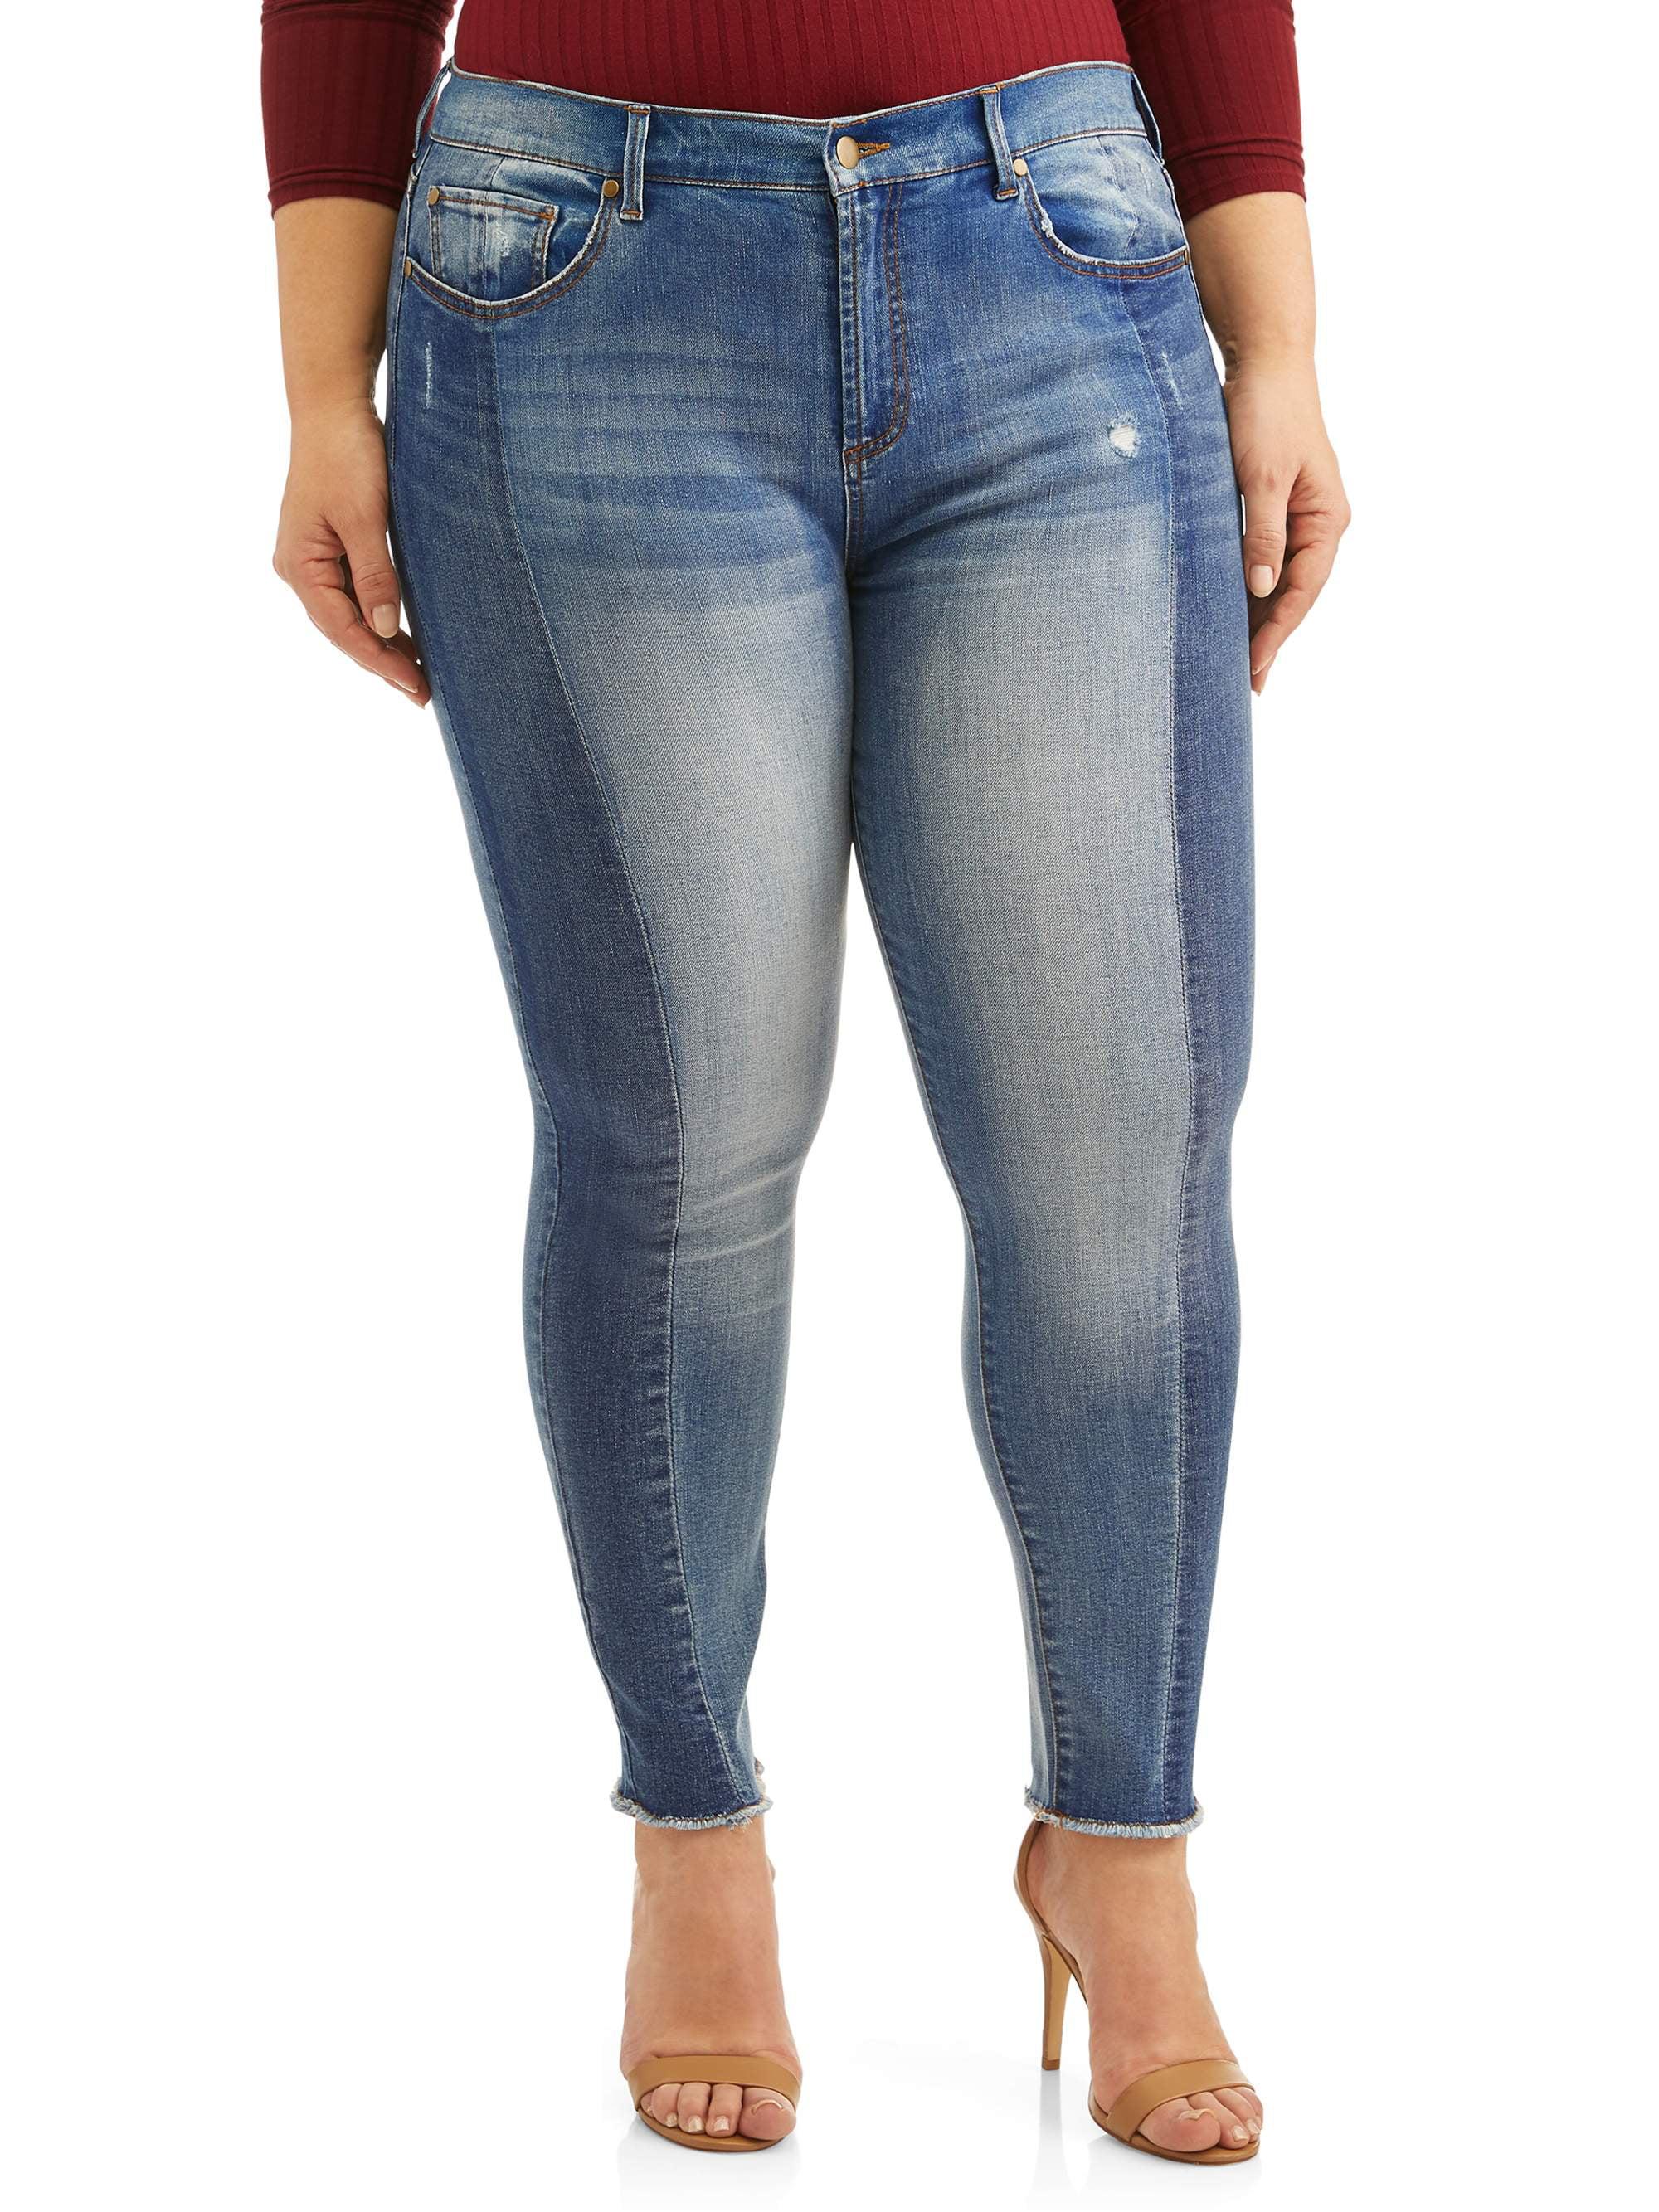 Women's Plus Size Cropped 2 Tone Jean with Fray Hem